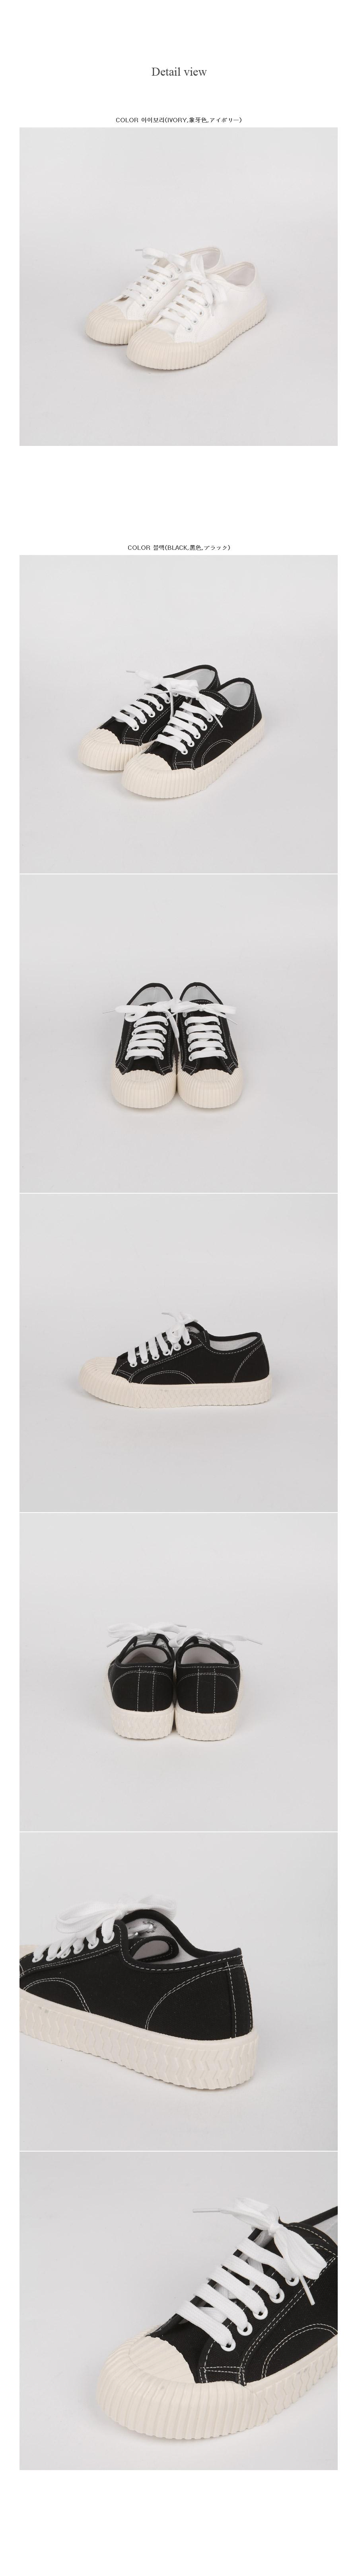 Blooder shoes